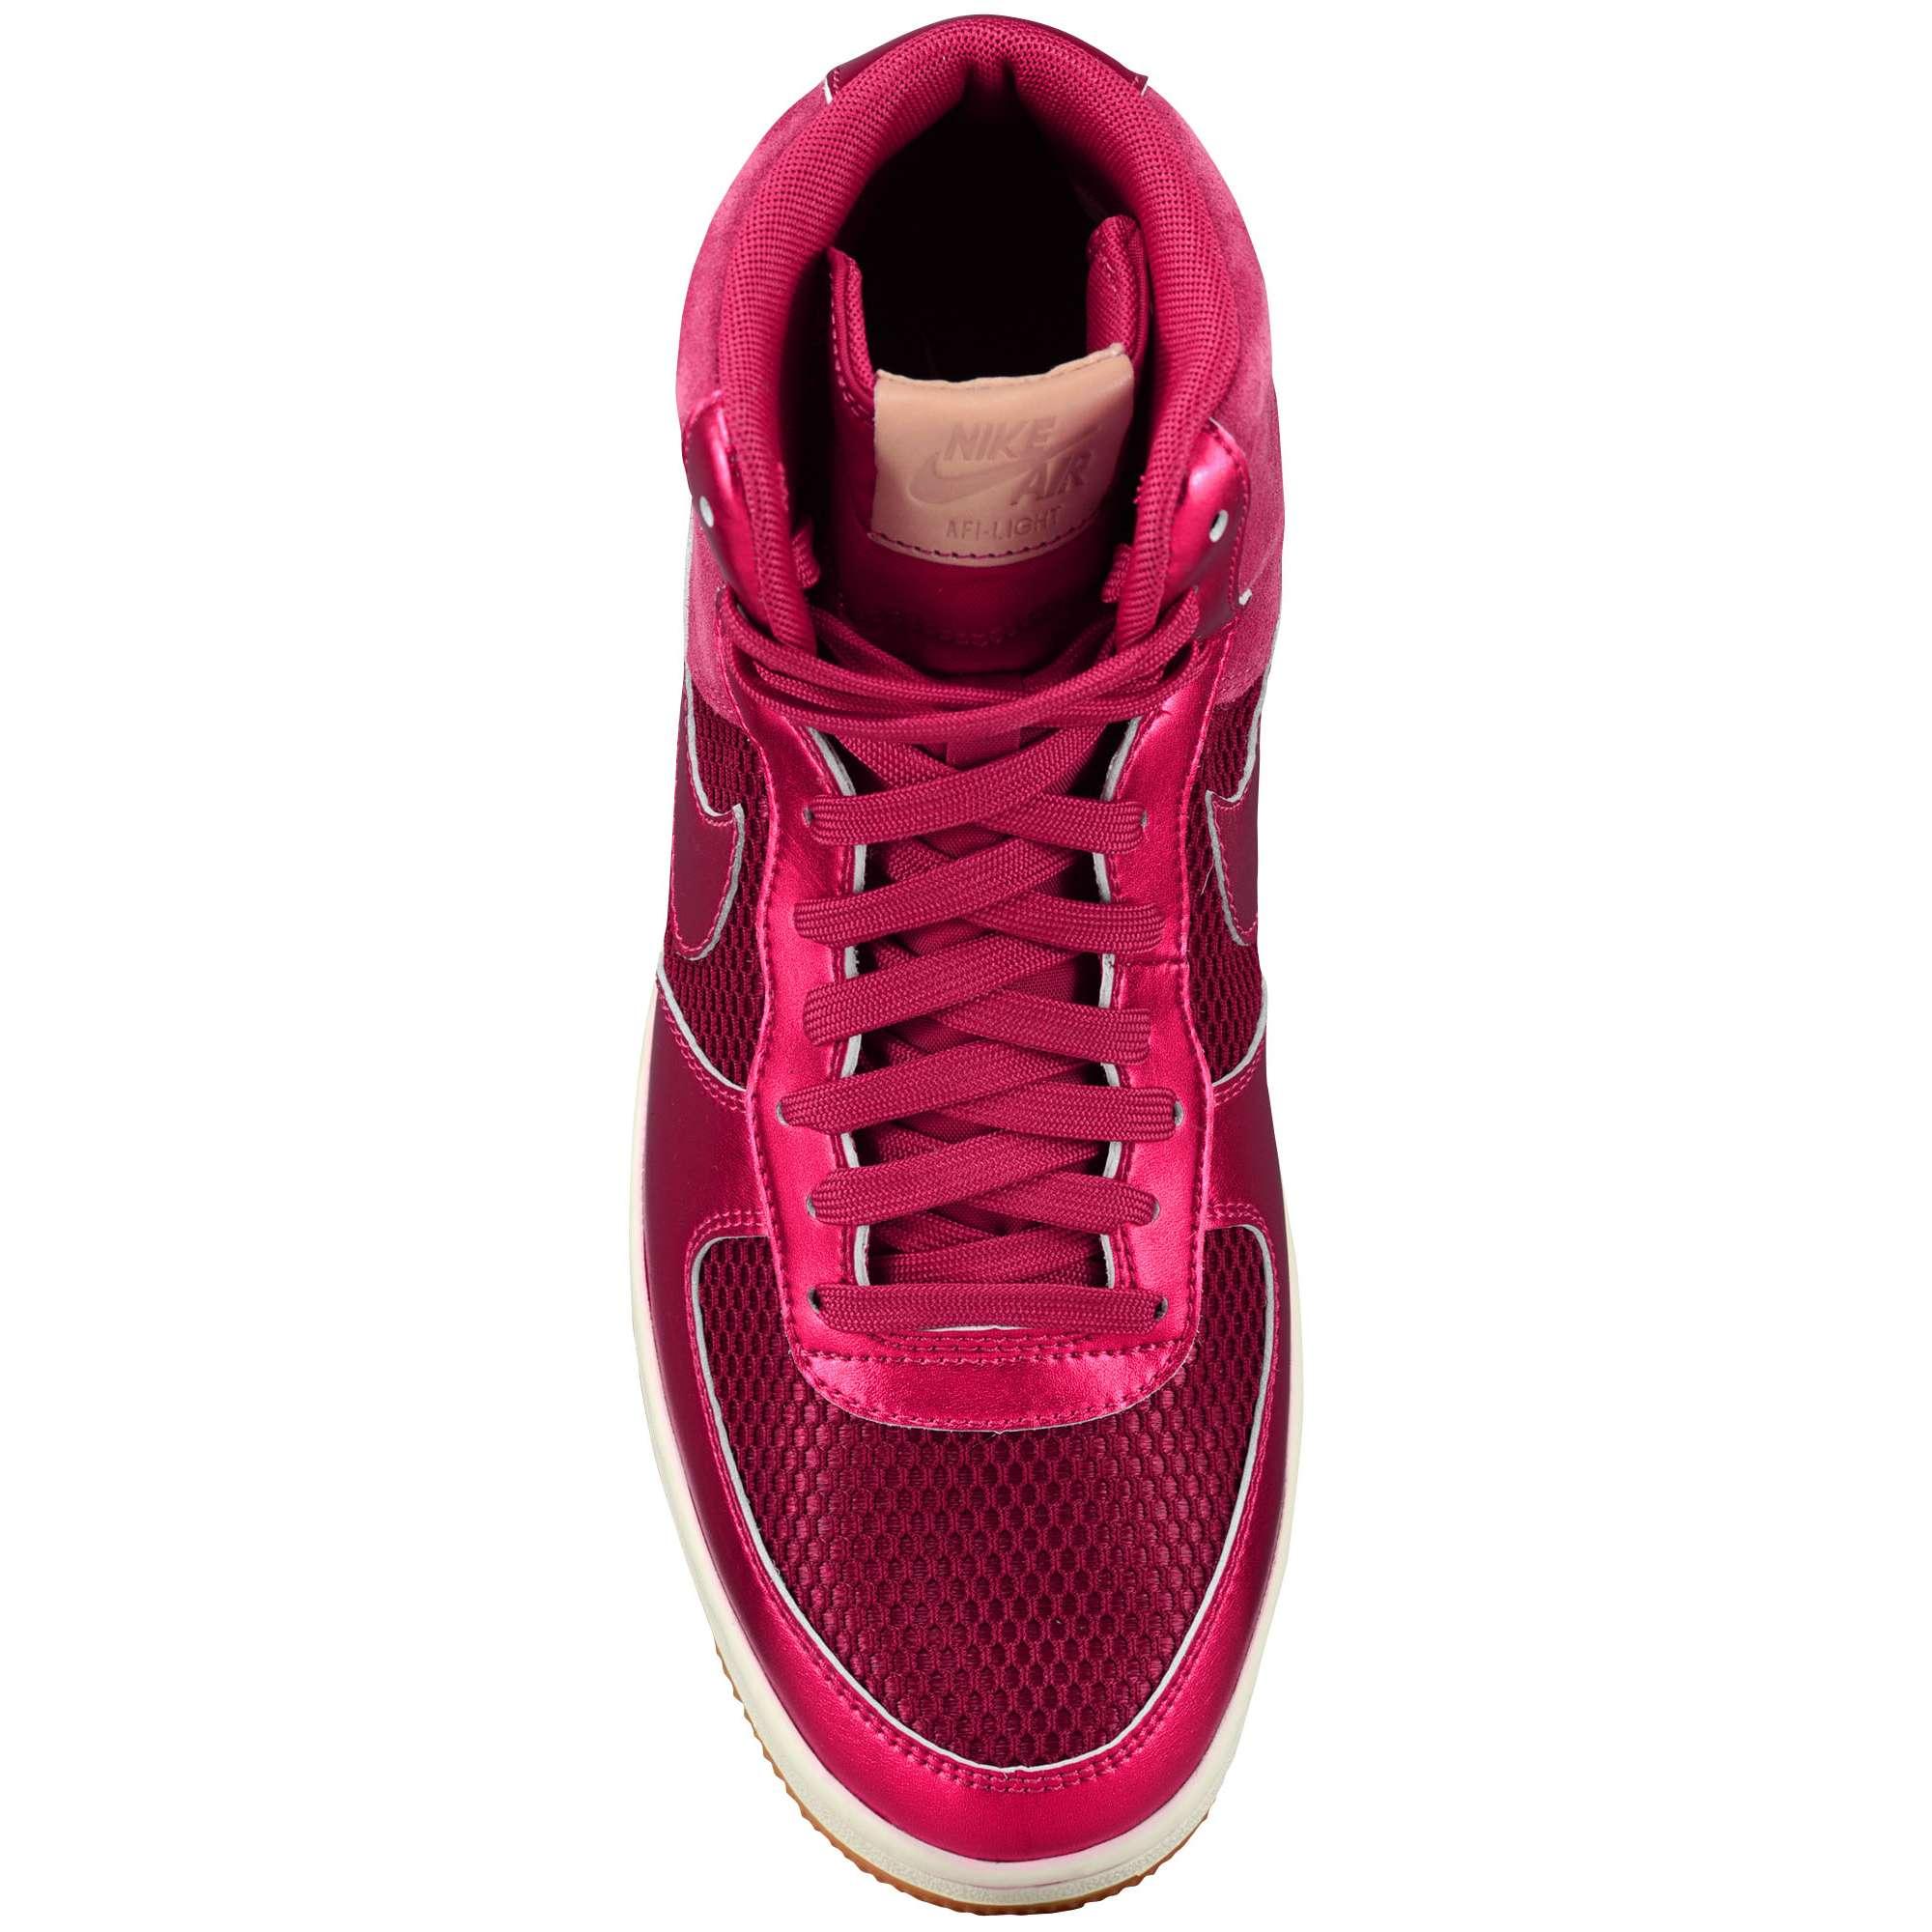 88ea2424e98b Nike Free 3.0 Studio Dance Review Fc Barcelona Uniform